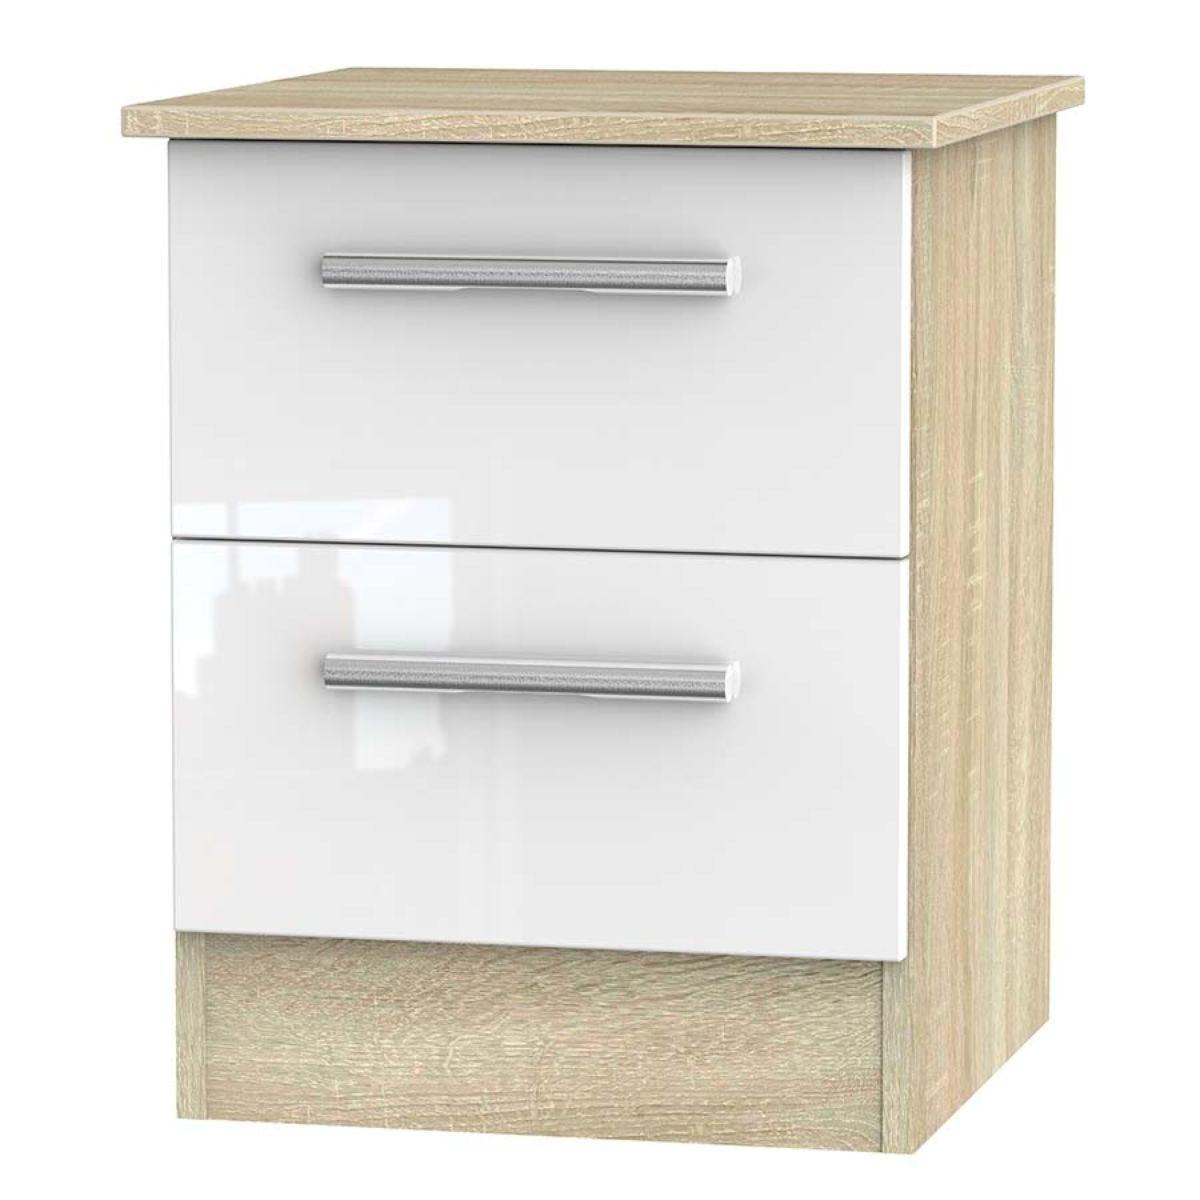 Goodland 2-Drawer Cabinet - White